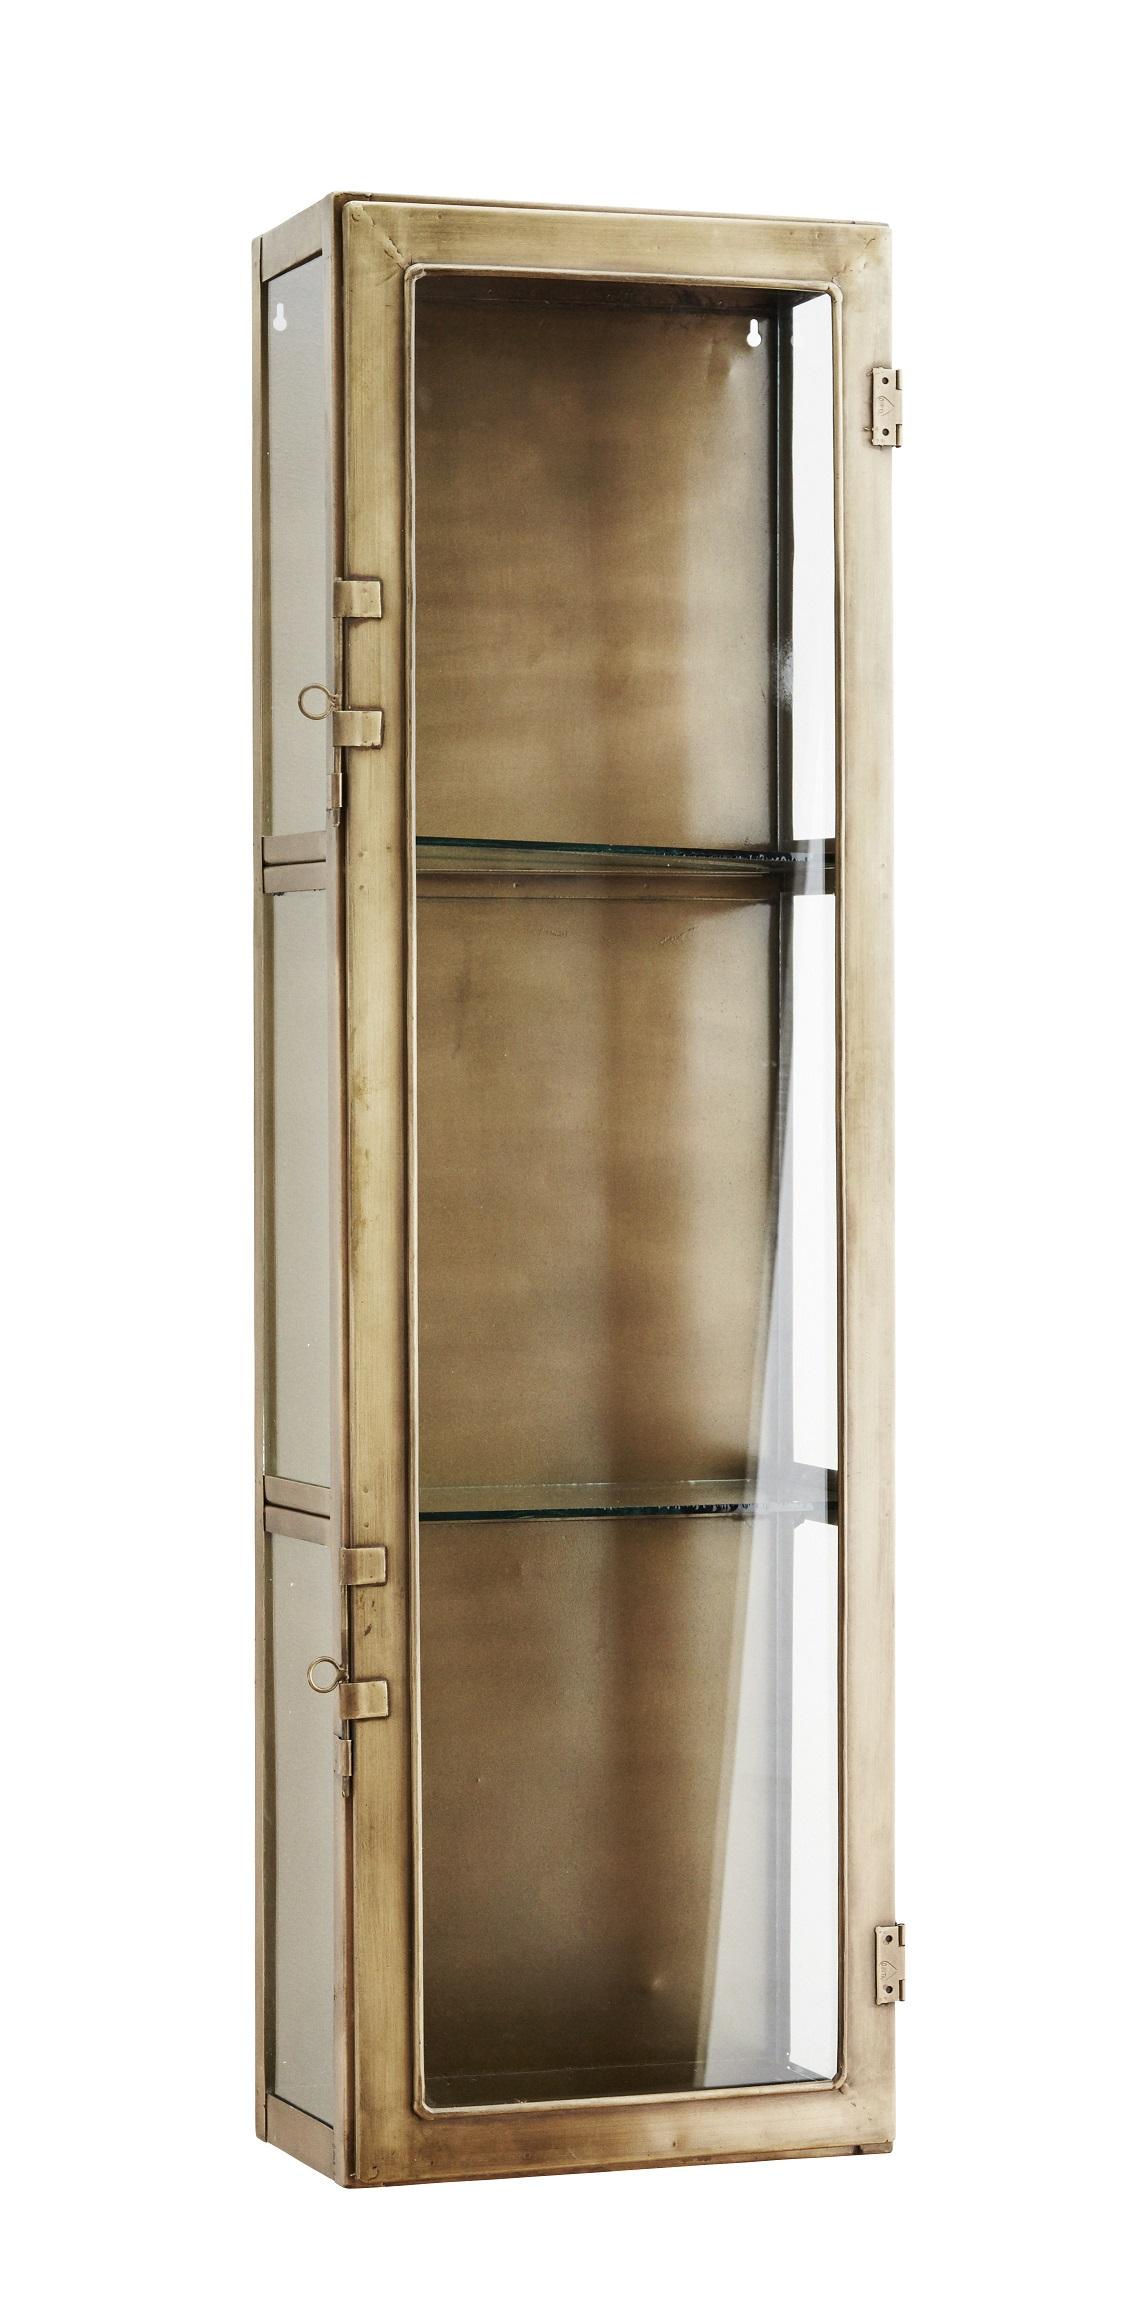 Iron glass shelf vägghylla